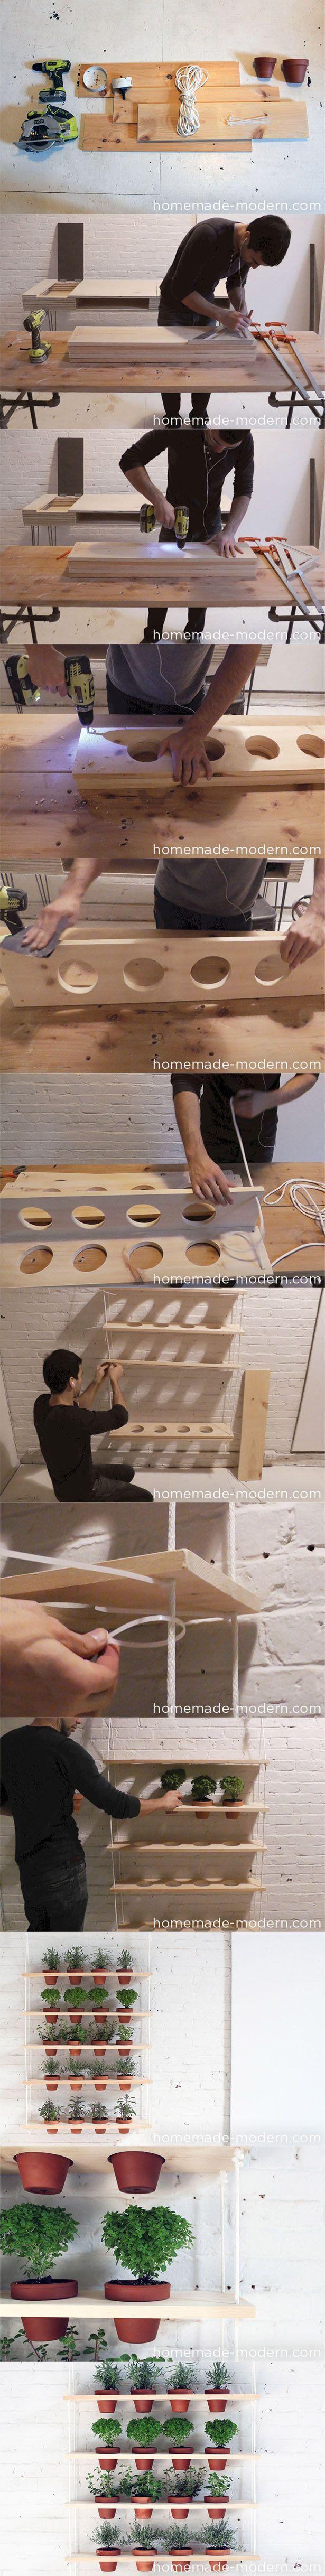 Jardin colgante DIY / http://homemade-modern.com/